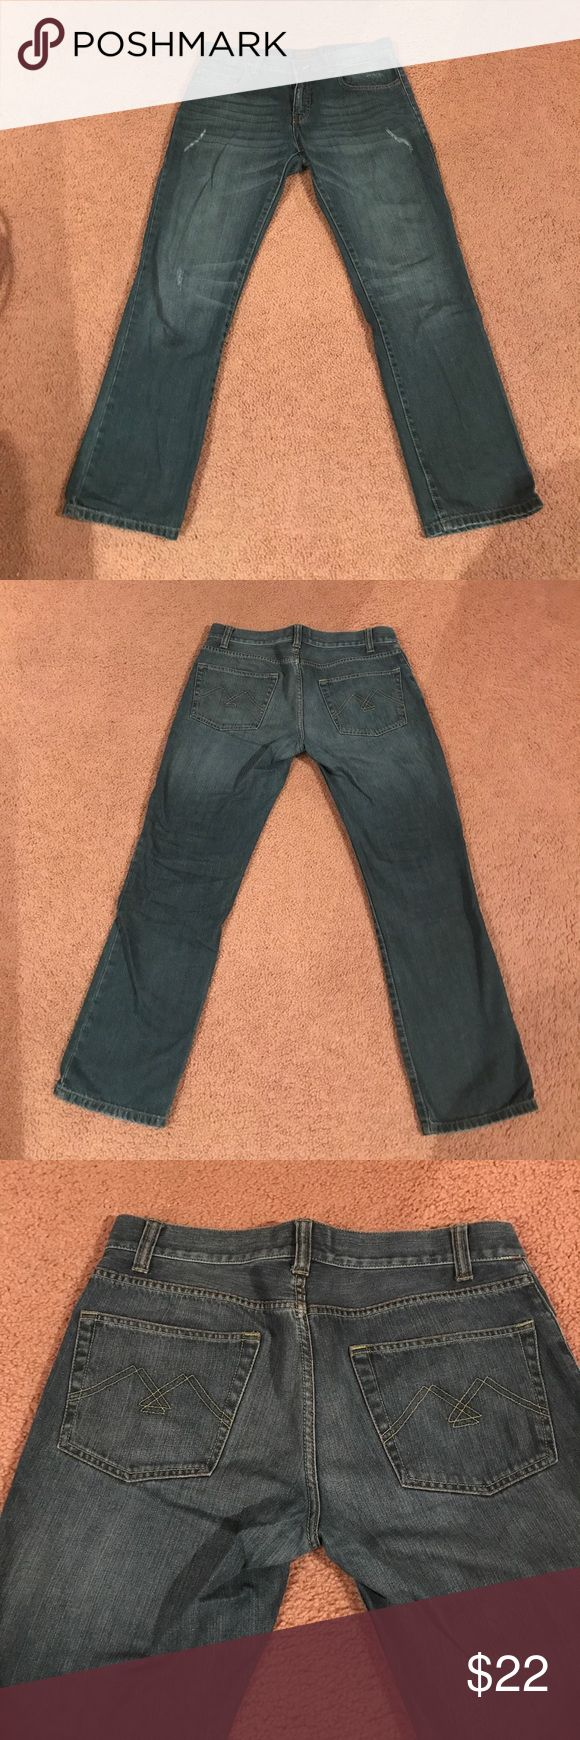 American Rag Jeans Medium wash American Rag jeans. Slight rip on each leg. Size 32 x 30 length. American Rag Jeans Slim Straight